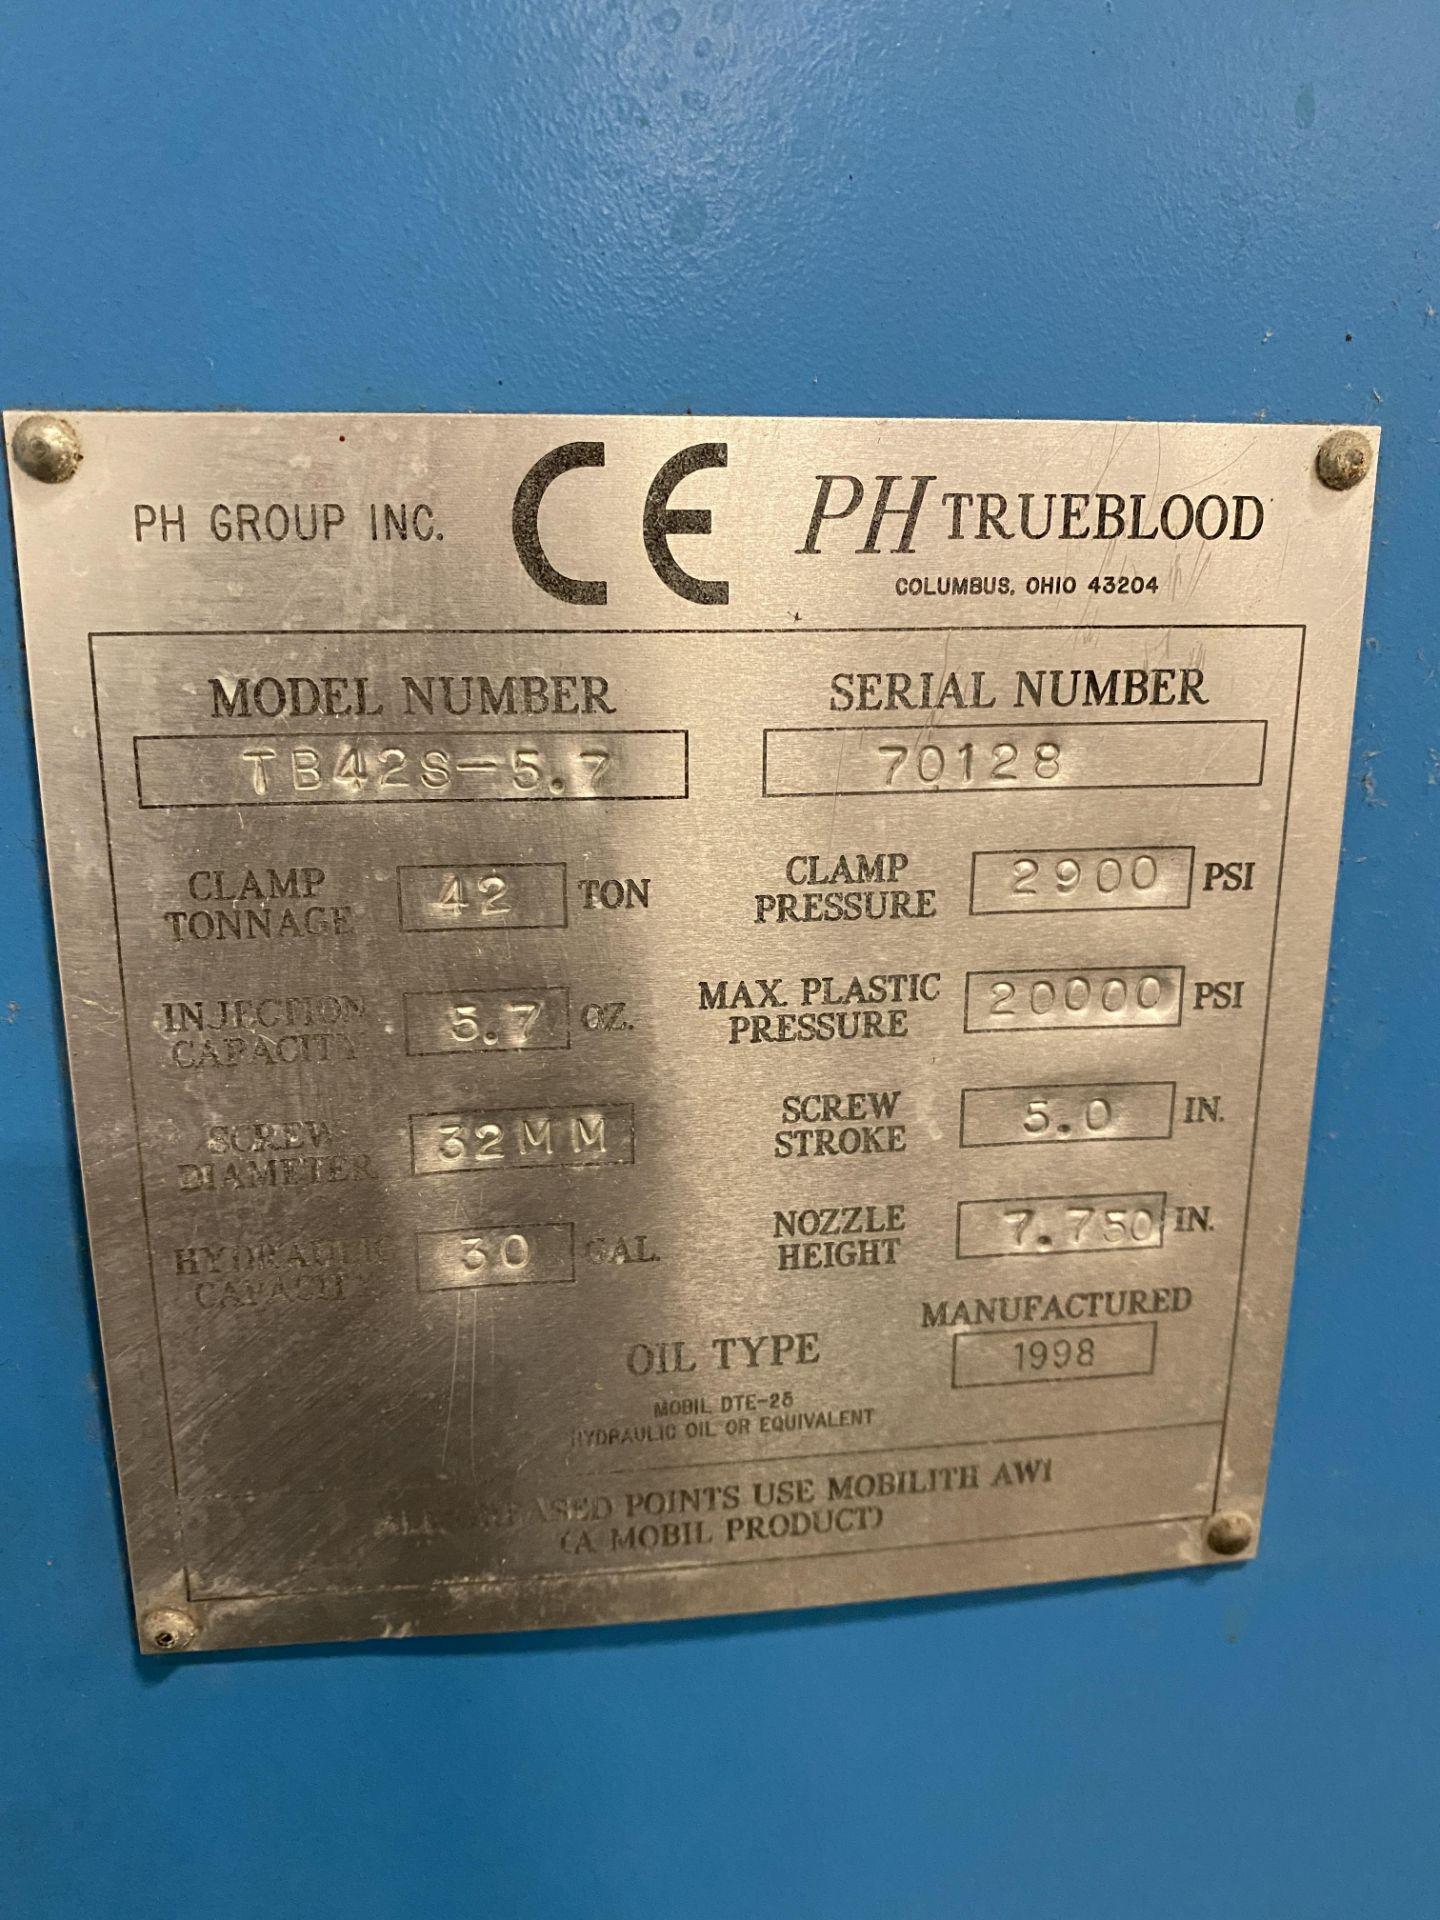 1998 PH Trueblood 42 Ton Plastic Injection Mold Machine - Image 13 of 13